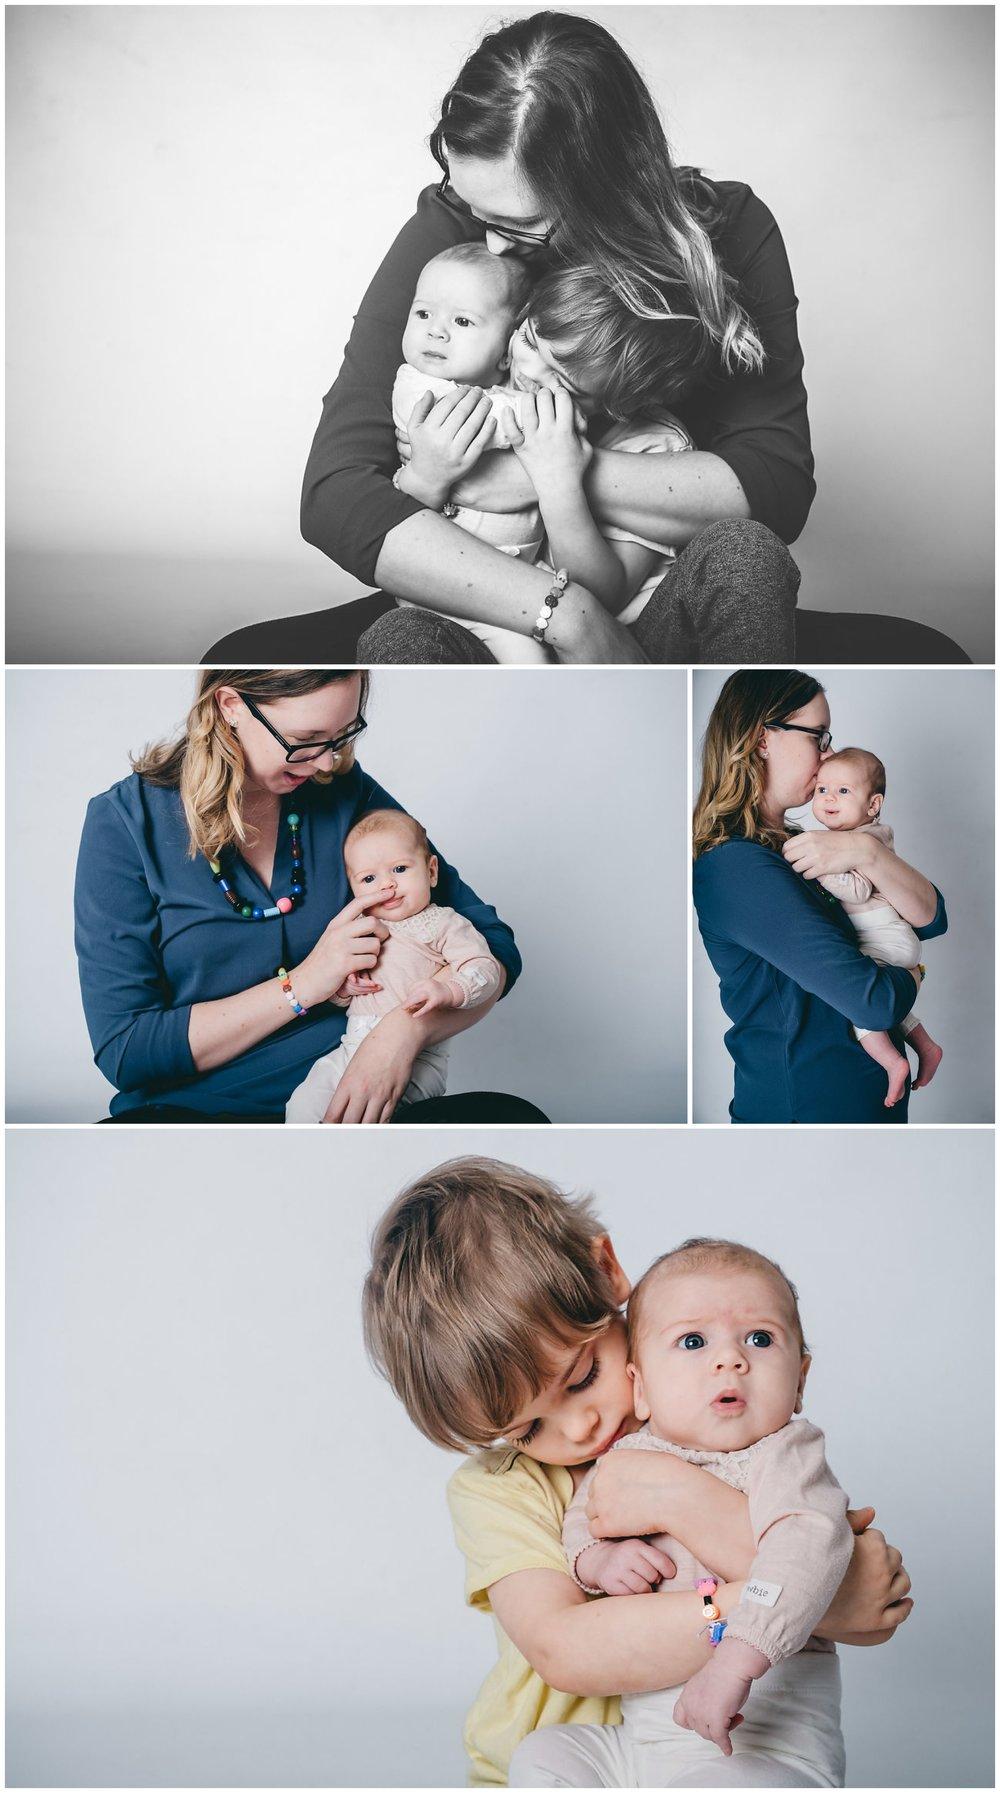 familjefotograf stockholm_familjefotografering_vallentuna_-familjefoograf täby linda rehlin_cecilia pihl